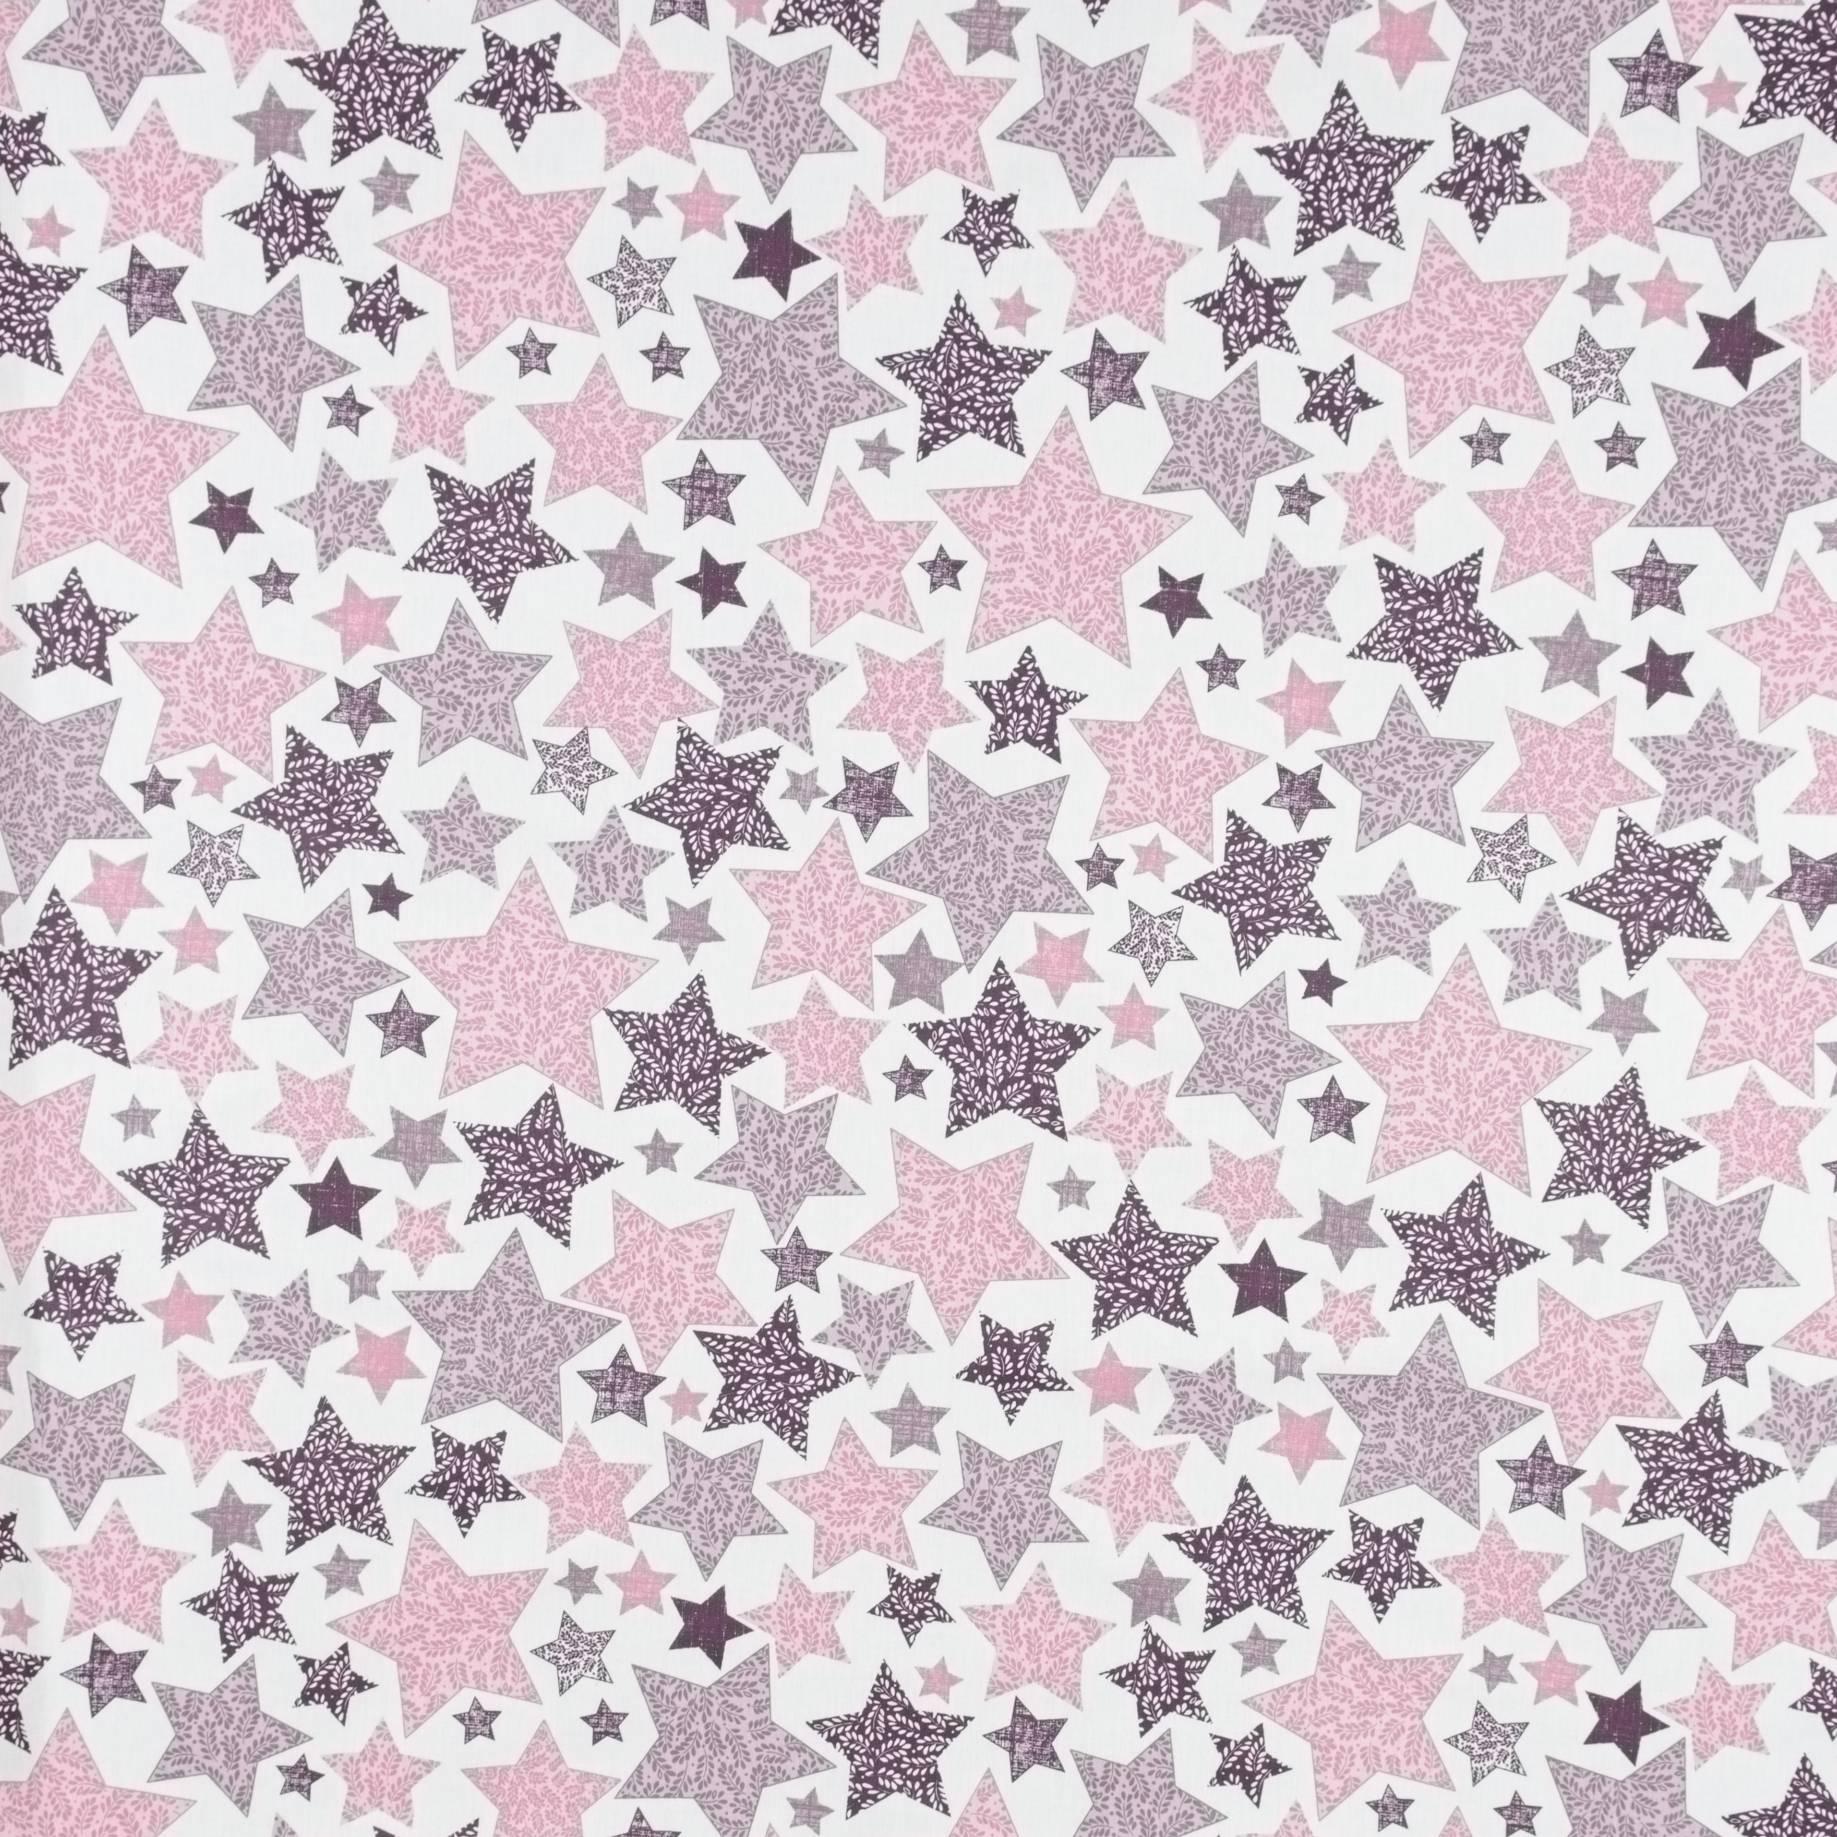 Бязь набивная, Renforce Lux, Звезды, розовый, 50х60 см, хлопок 100%, 120 г/м²